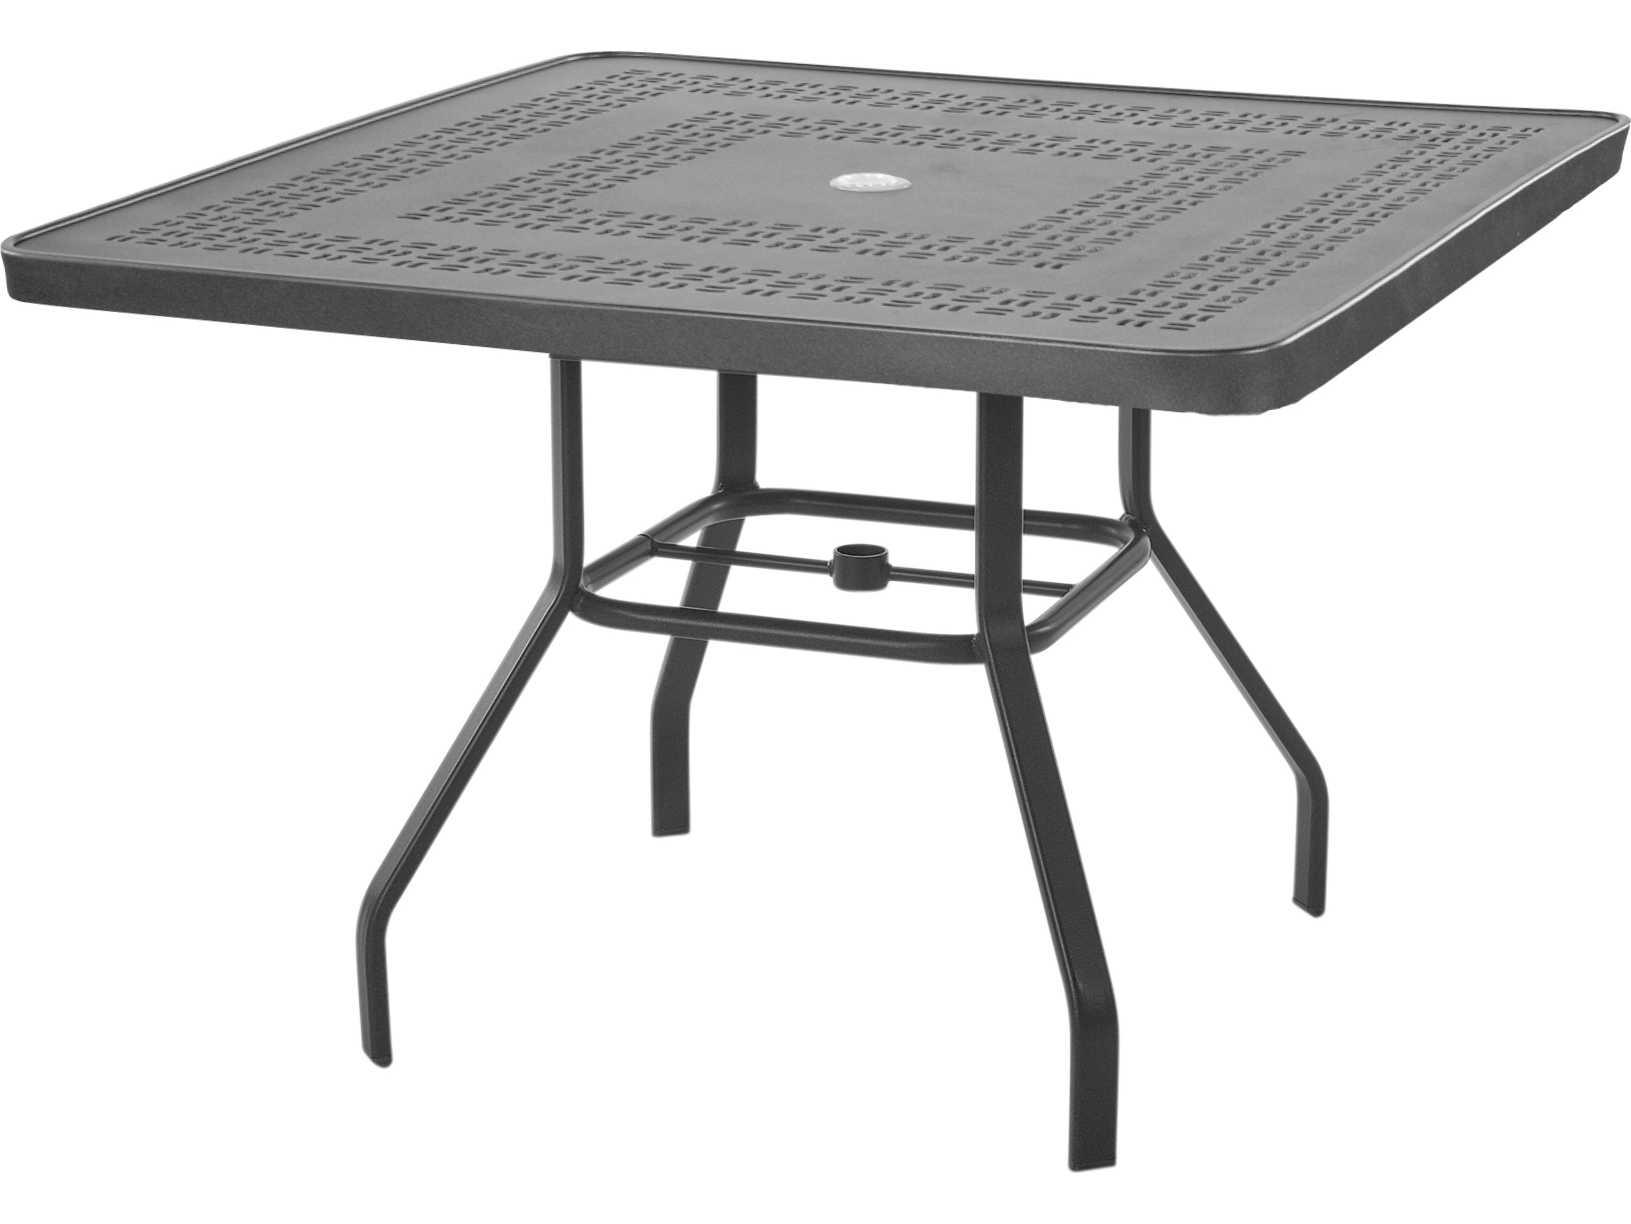 windward design group mayan punched aluminum 42 square dining table kd4218smyn. Black Bedroom Furniture Sets. Home Design Ideas